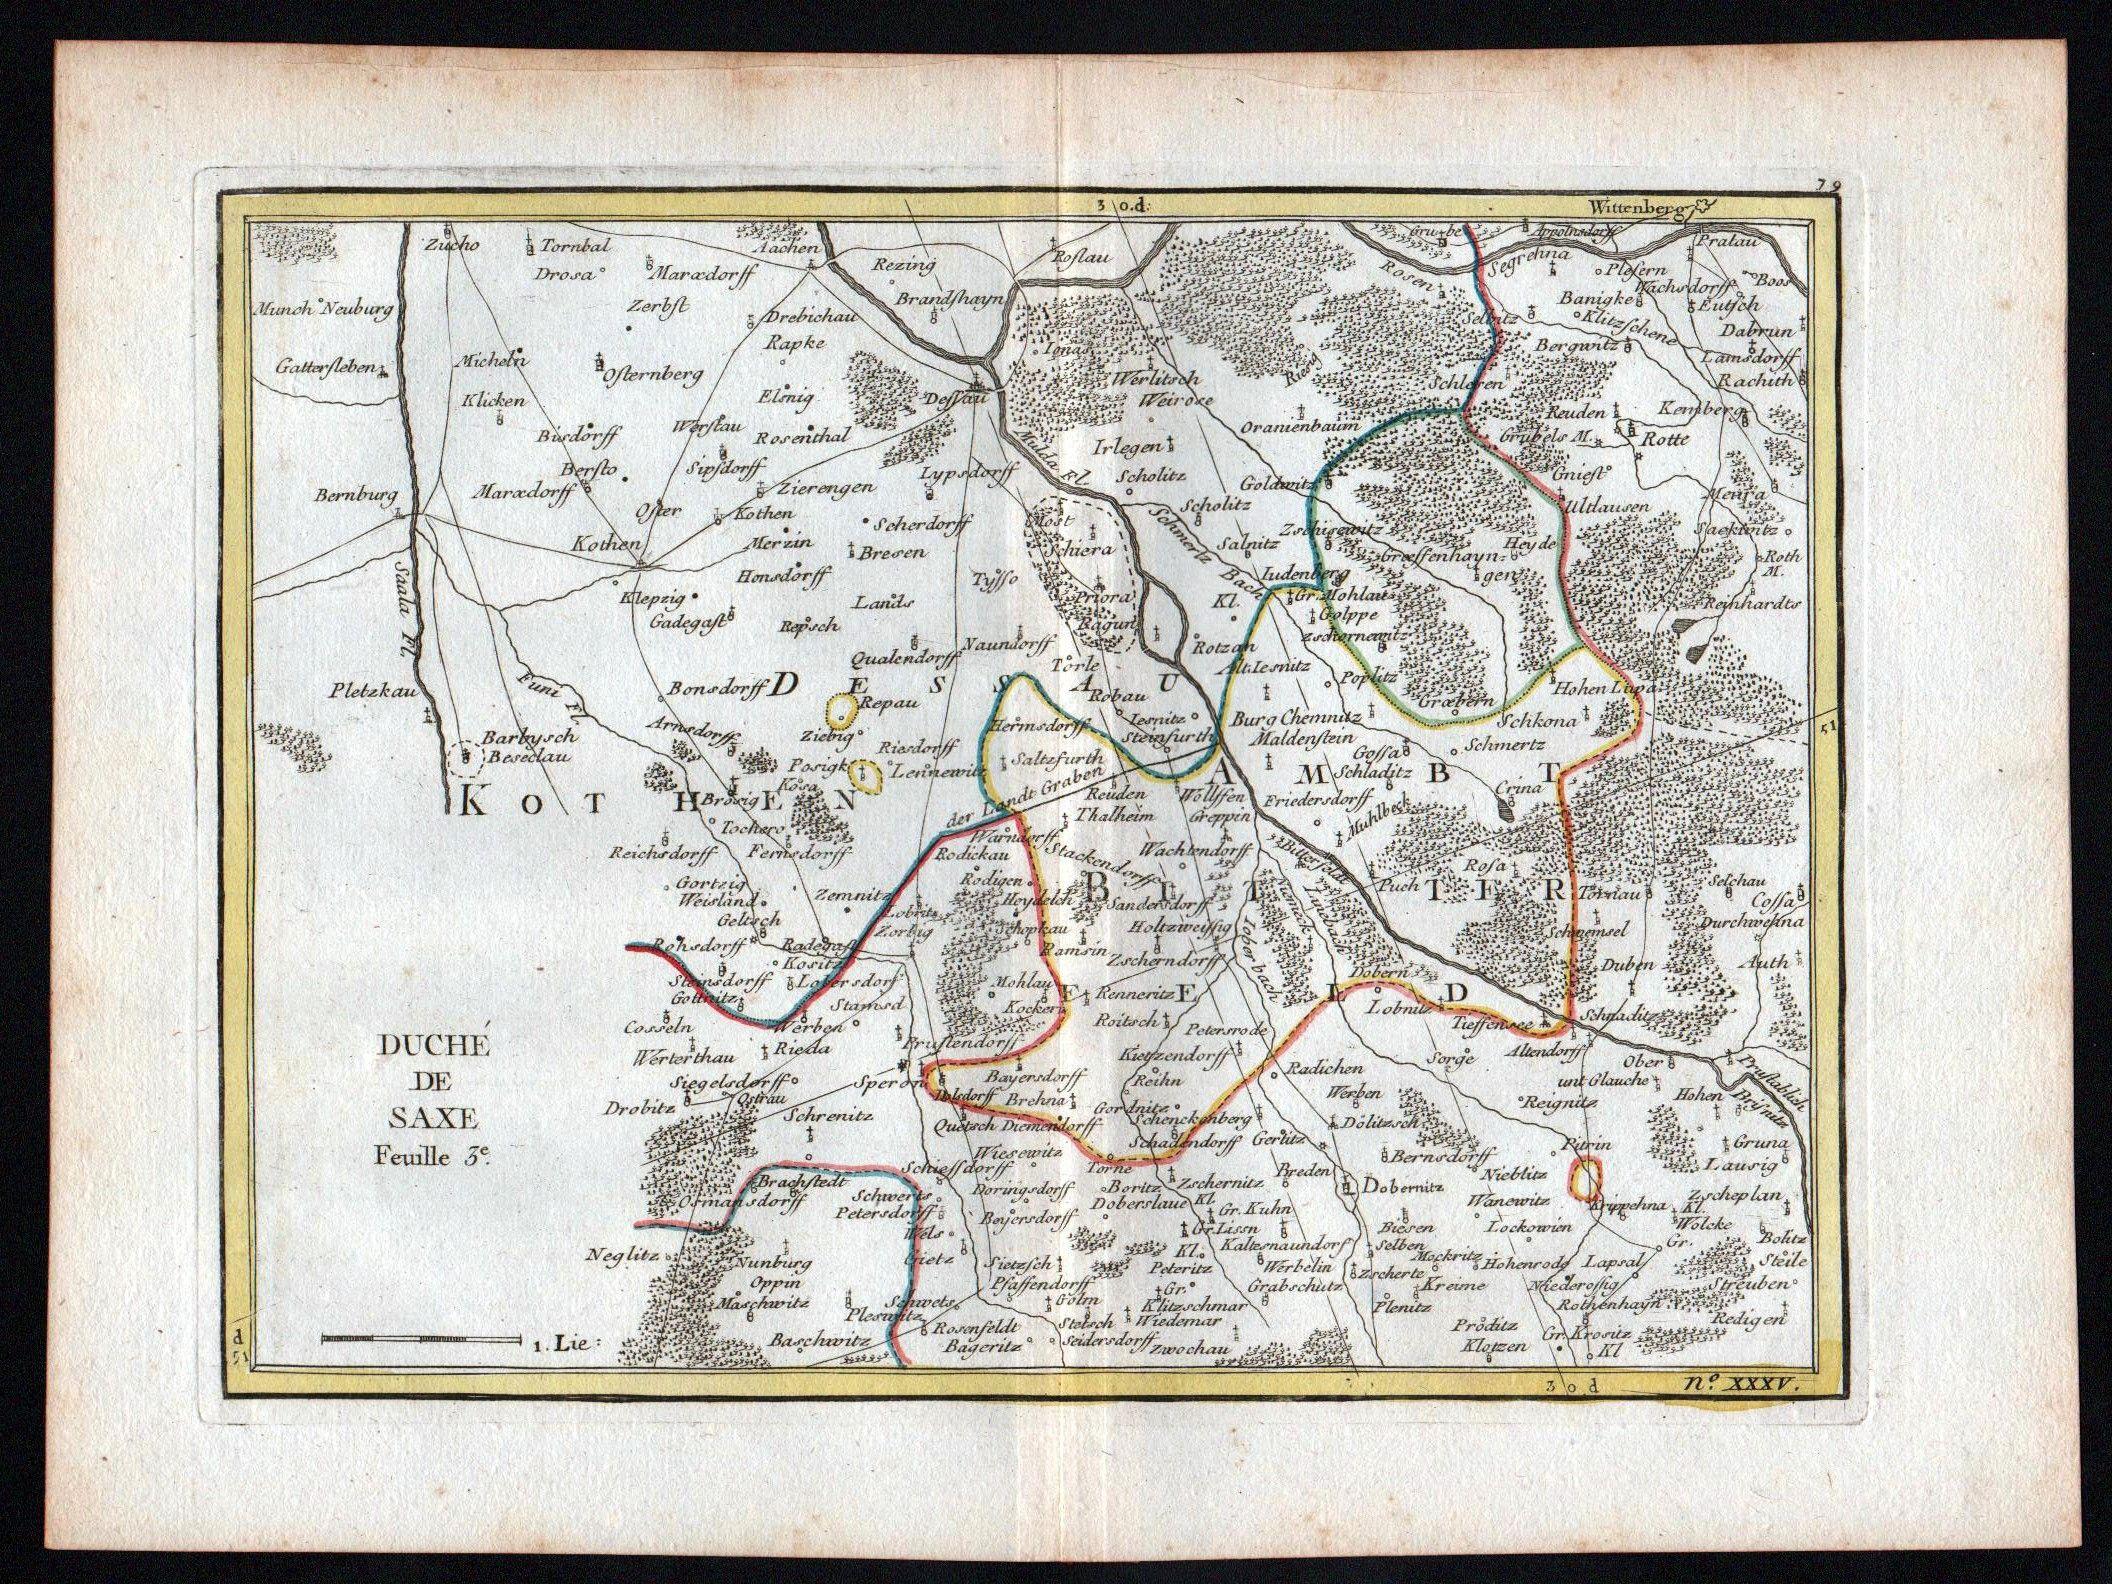 Le Rouge Georges Louis 17071790 Saxe Feuille 3 Bitterfeld